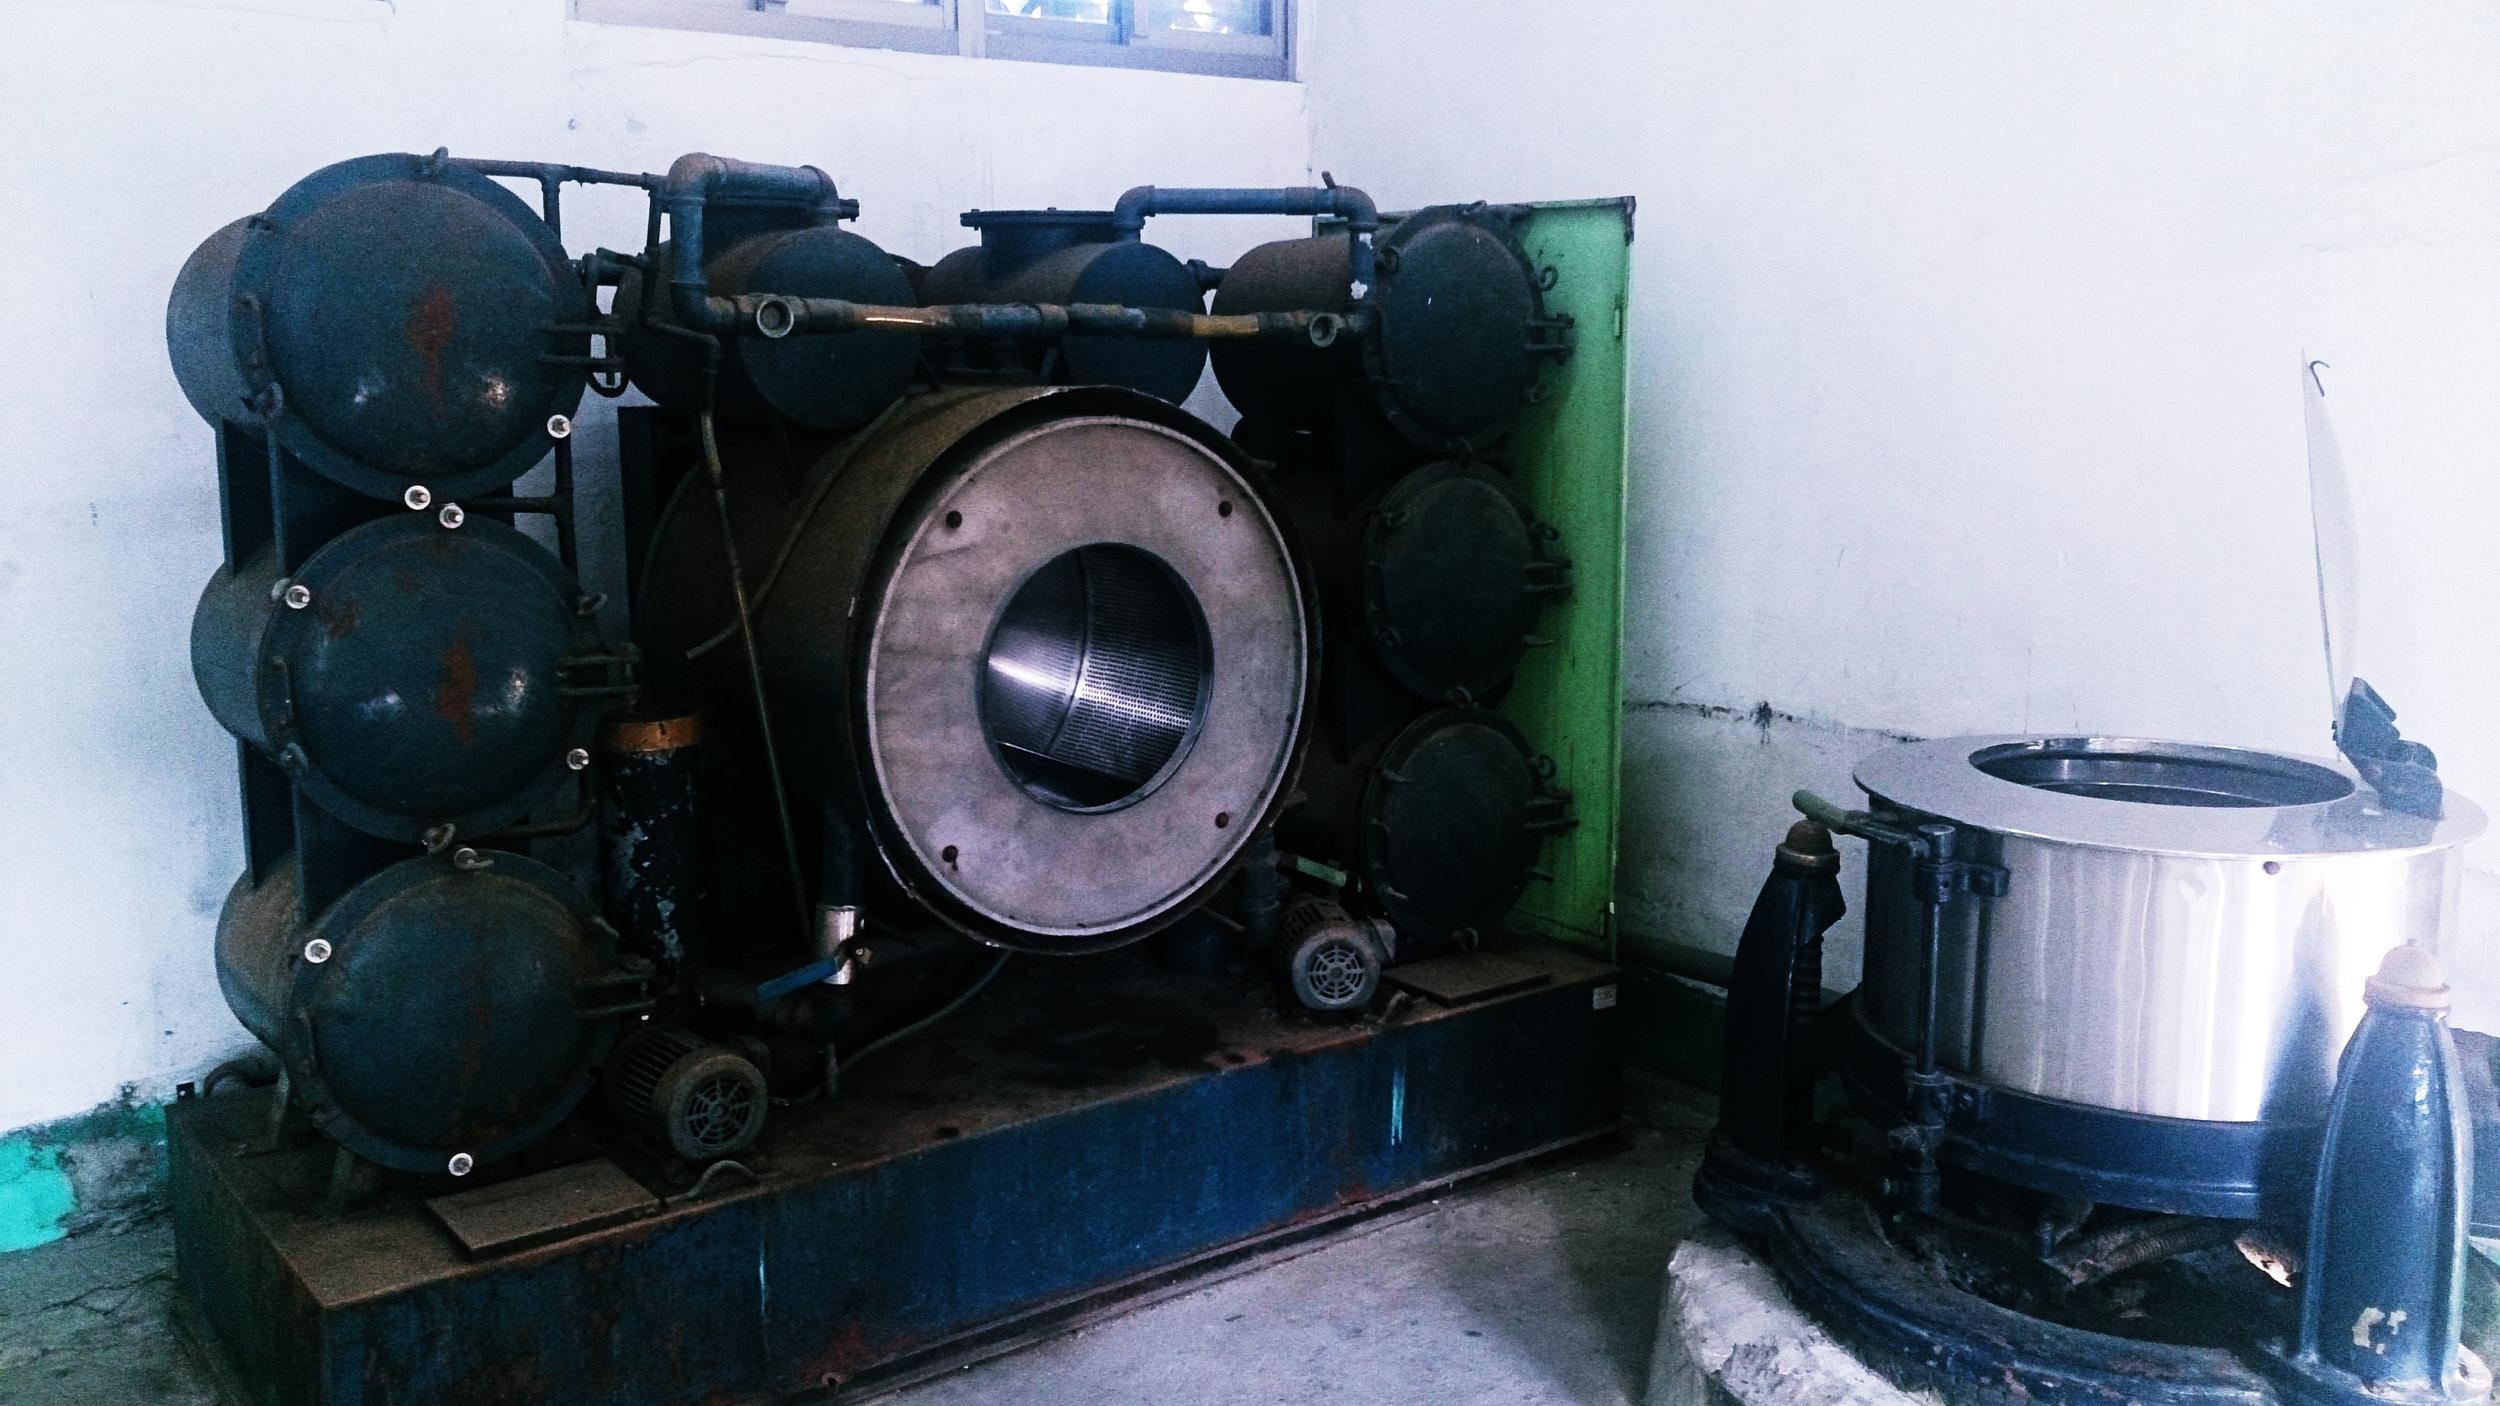 A huge clothes dryer